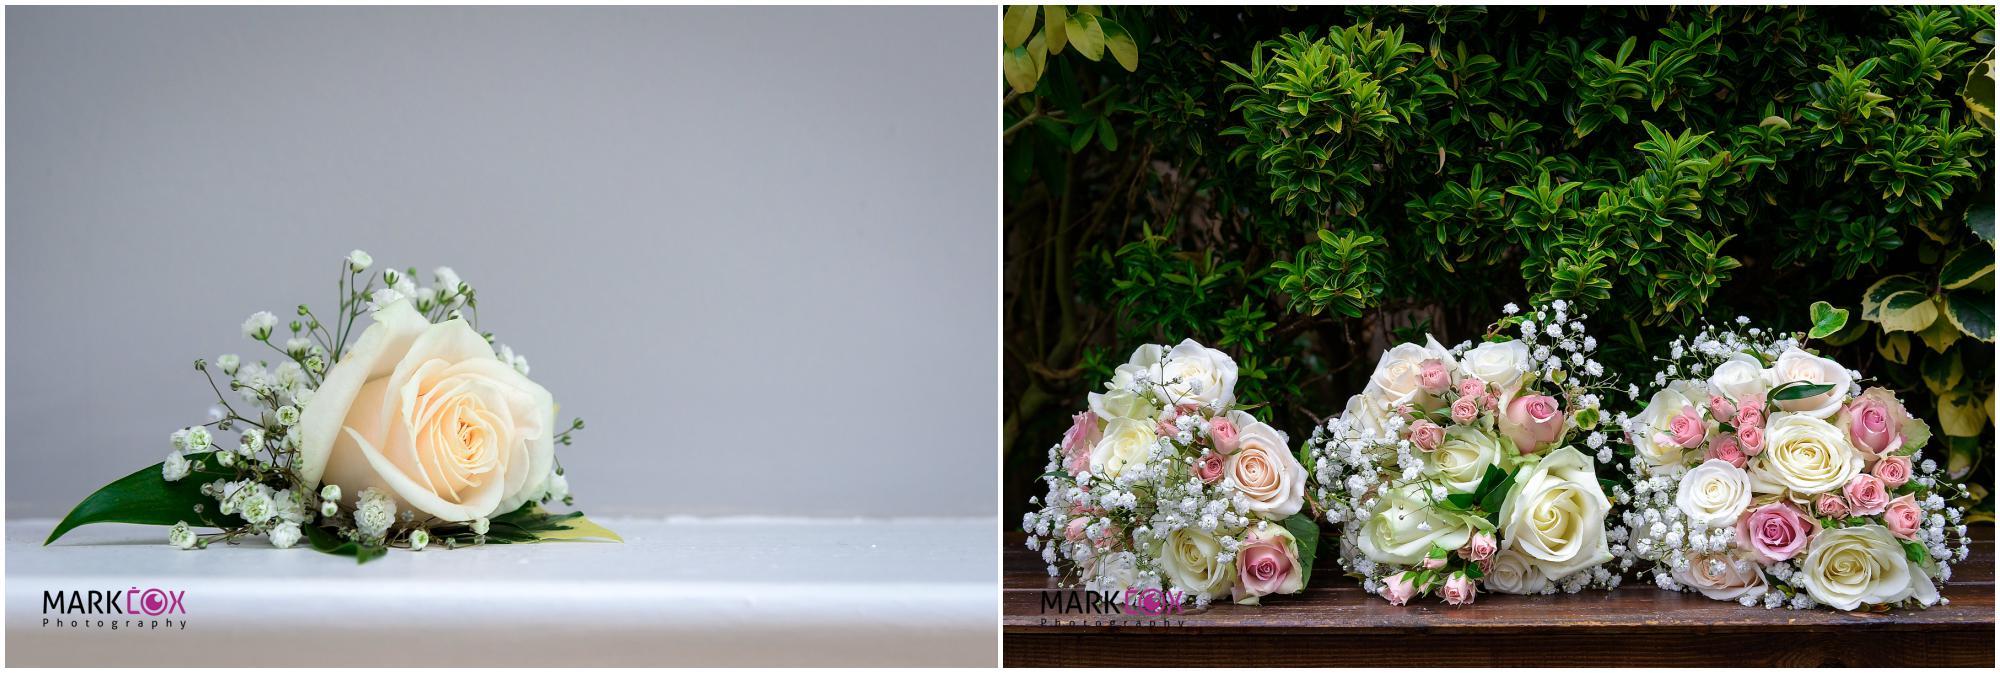 British Flowers Week - Taunton Wedding Photographer-002